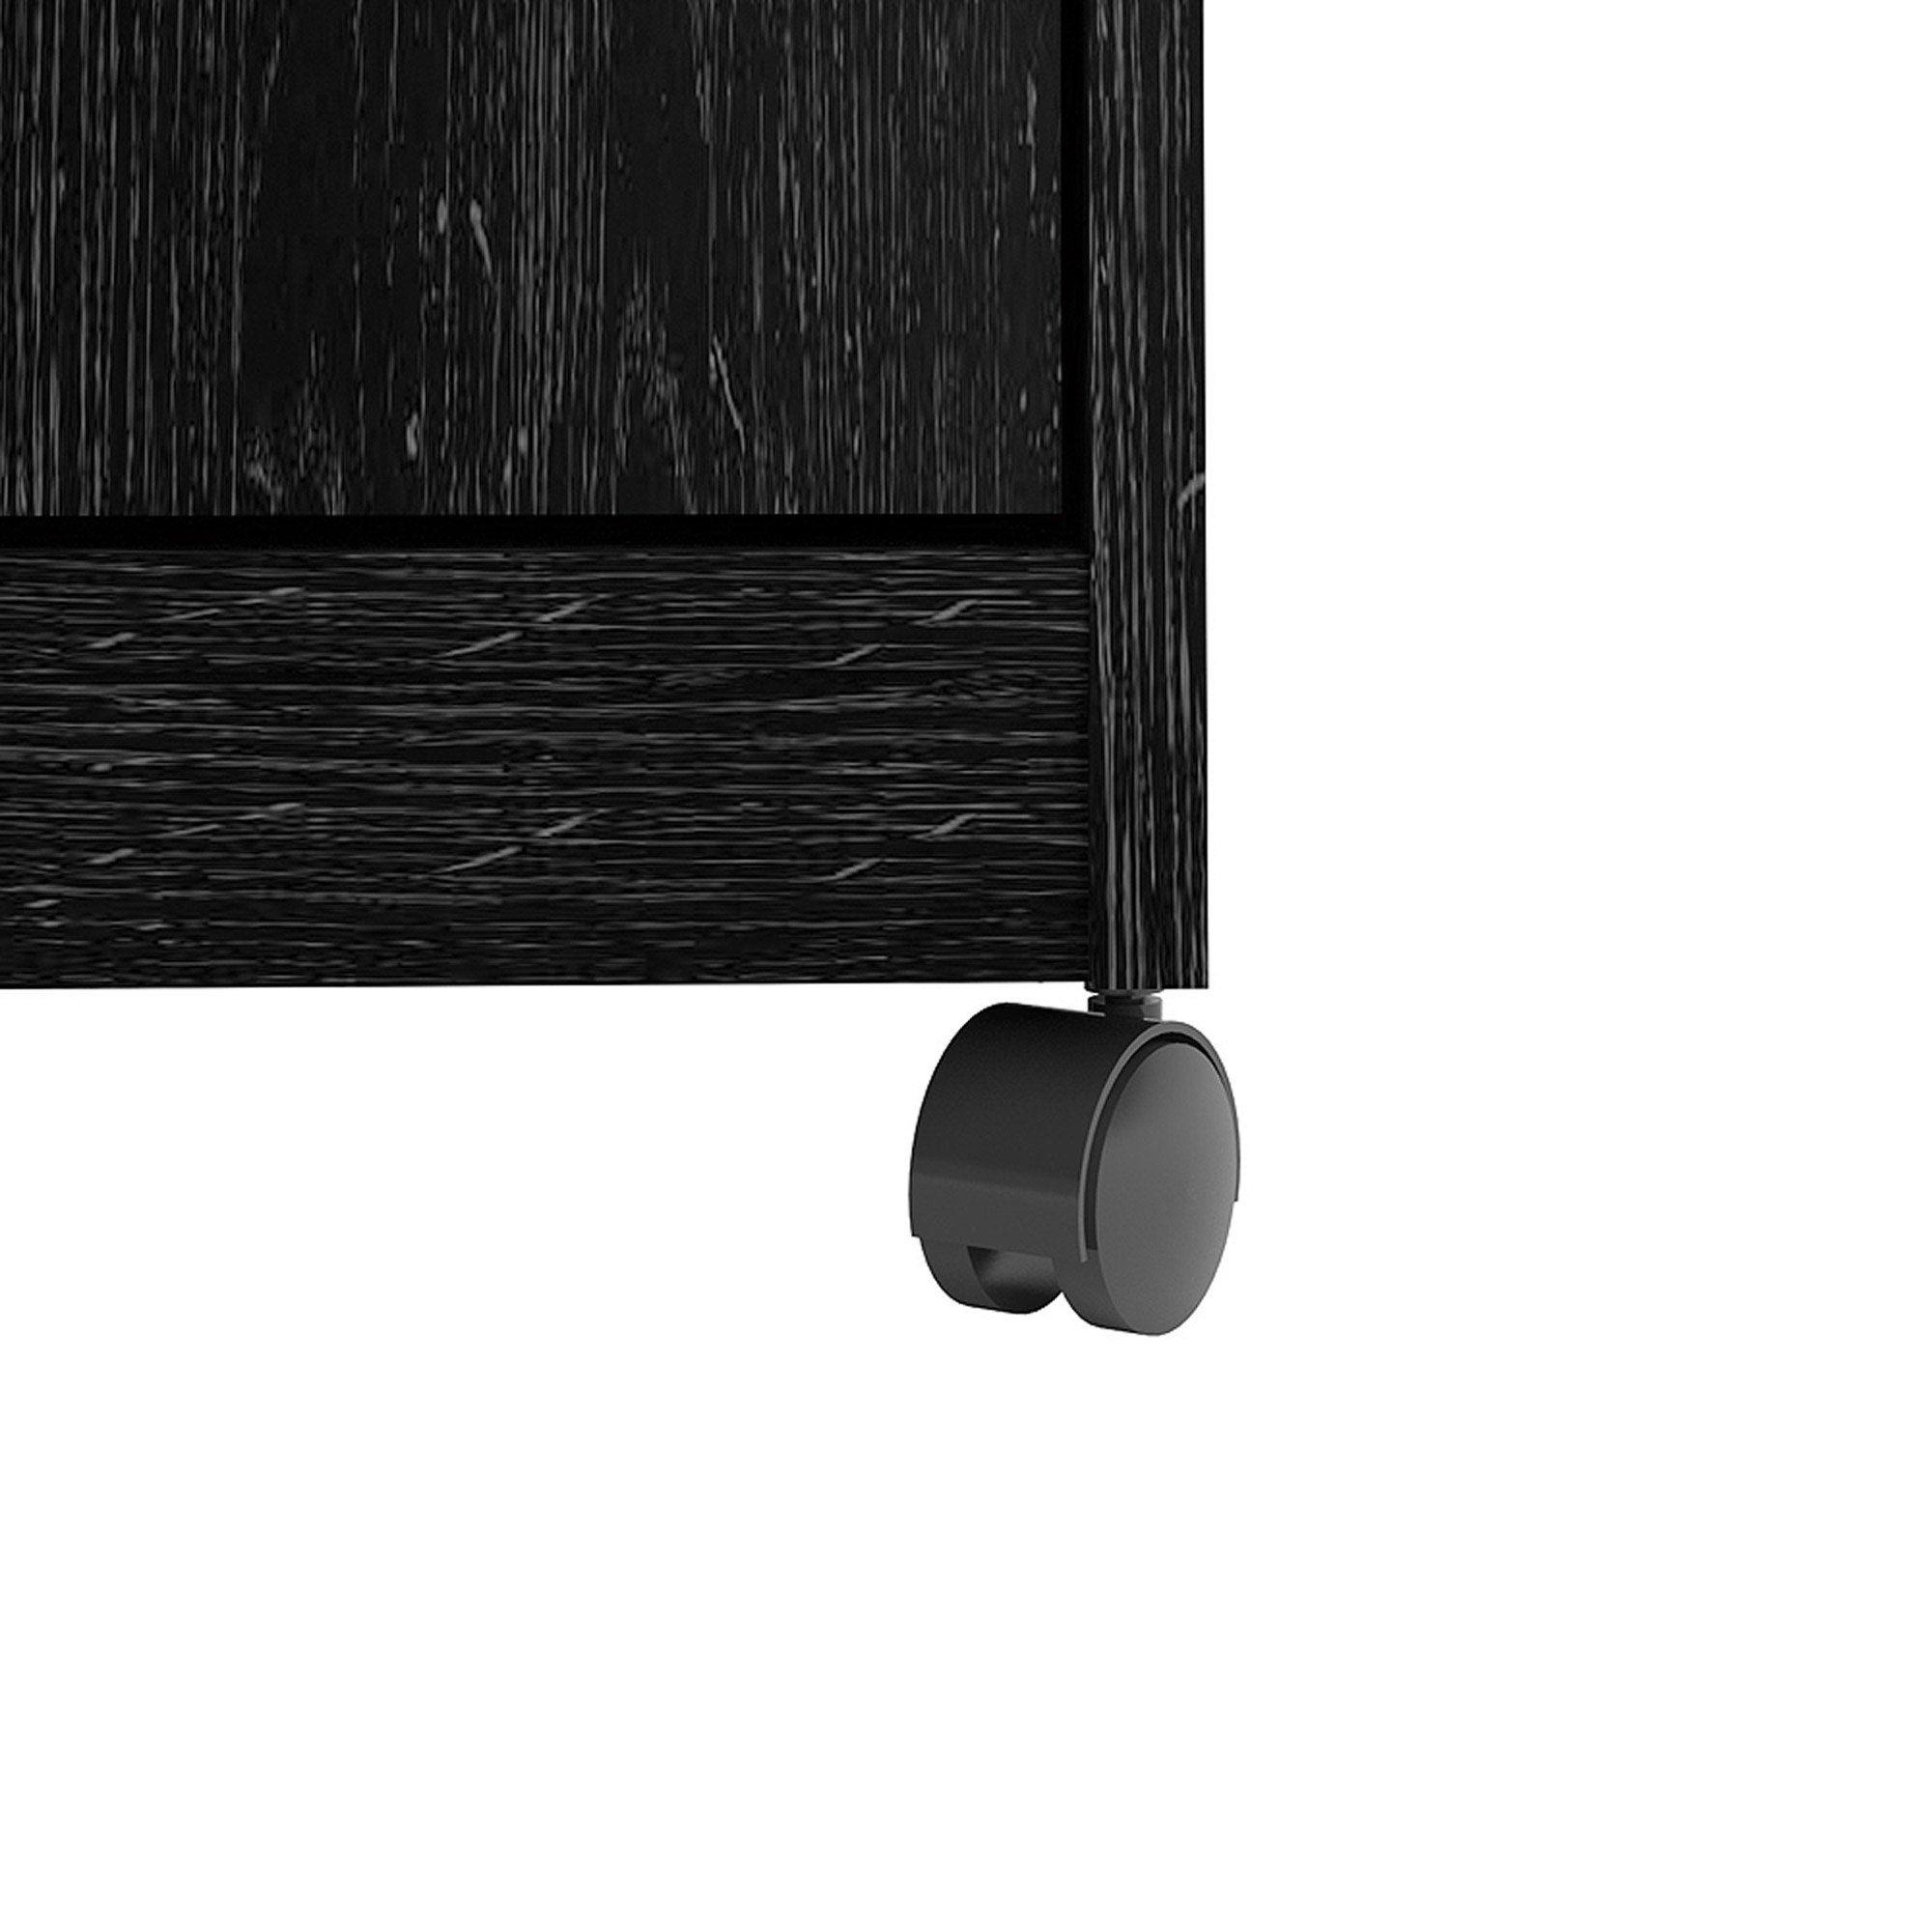 Pin on Diy kitchen storage